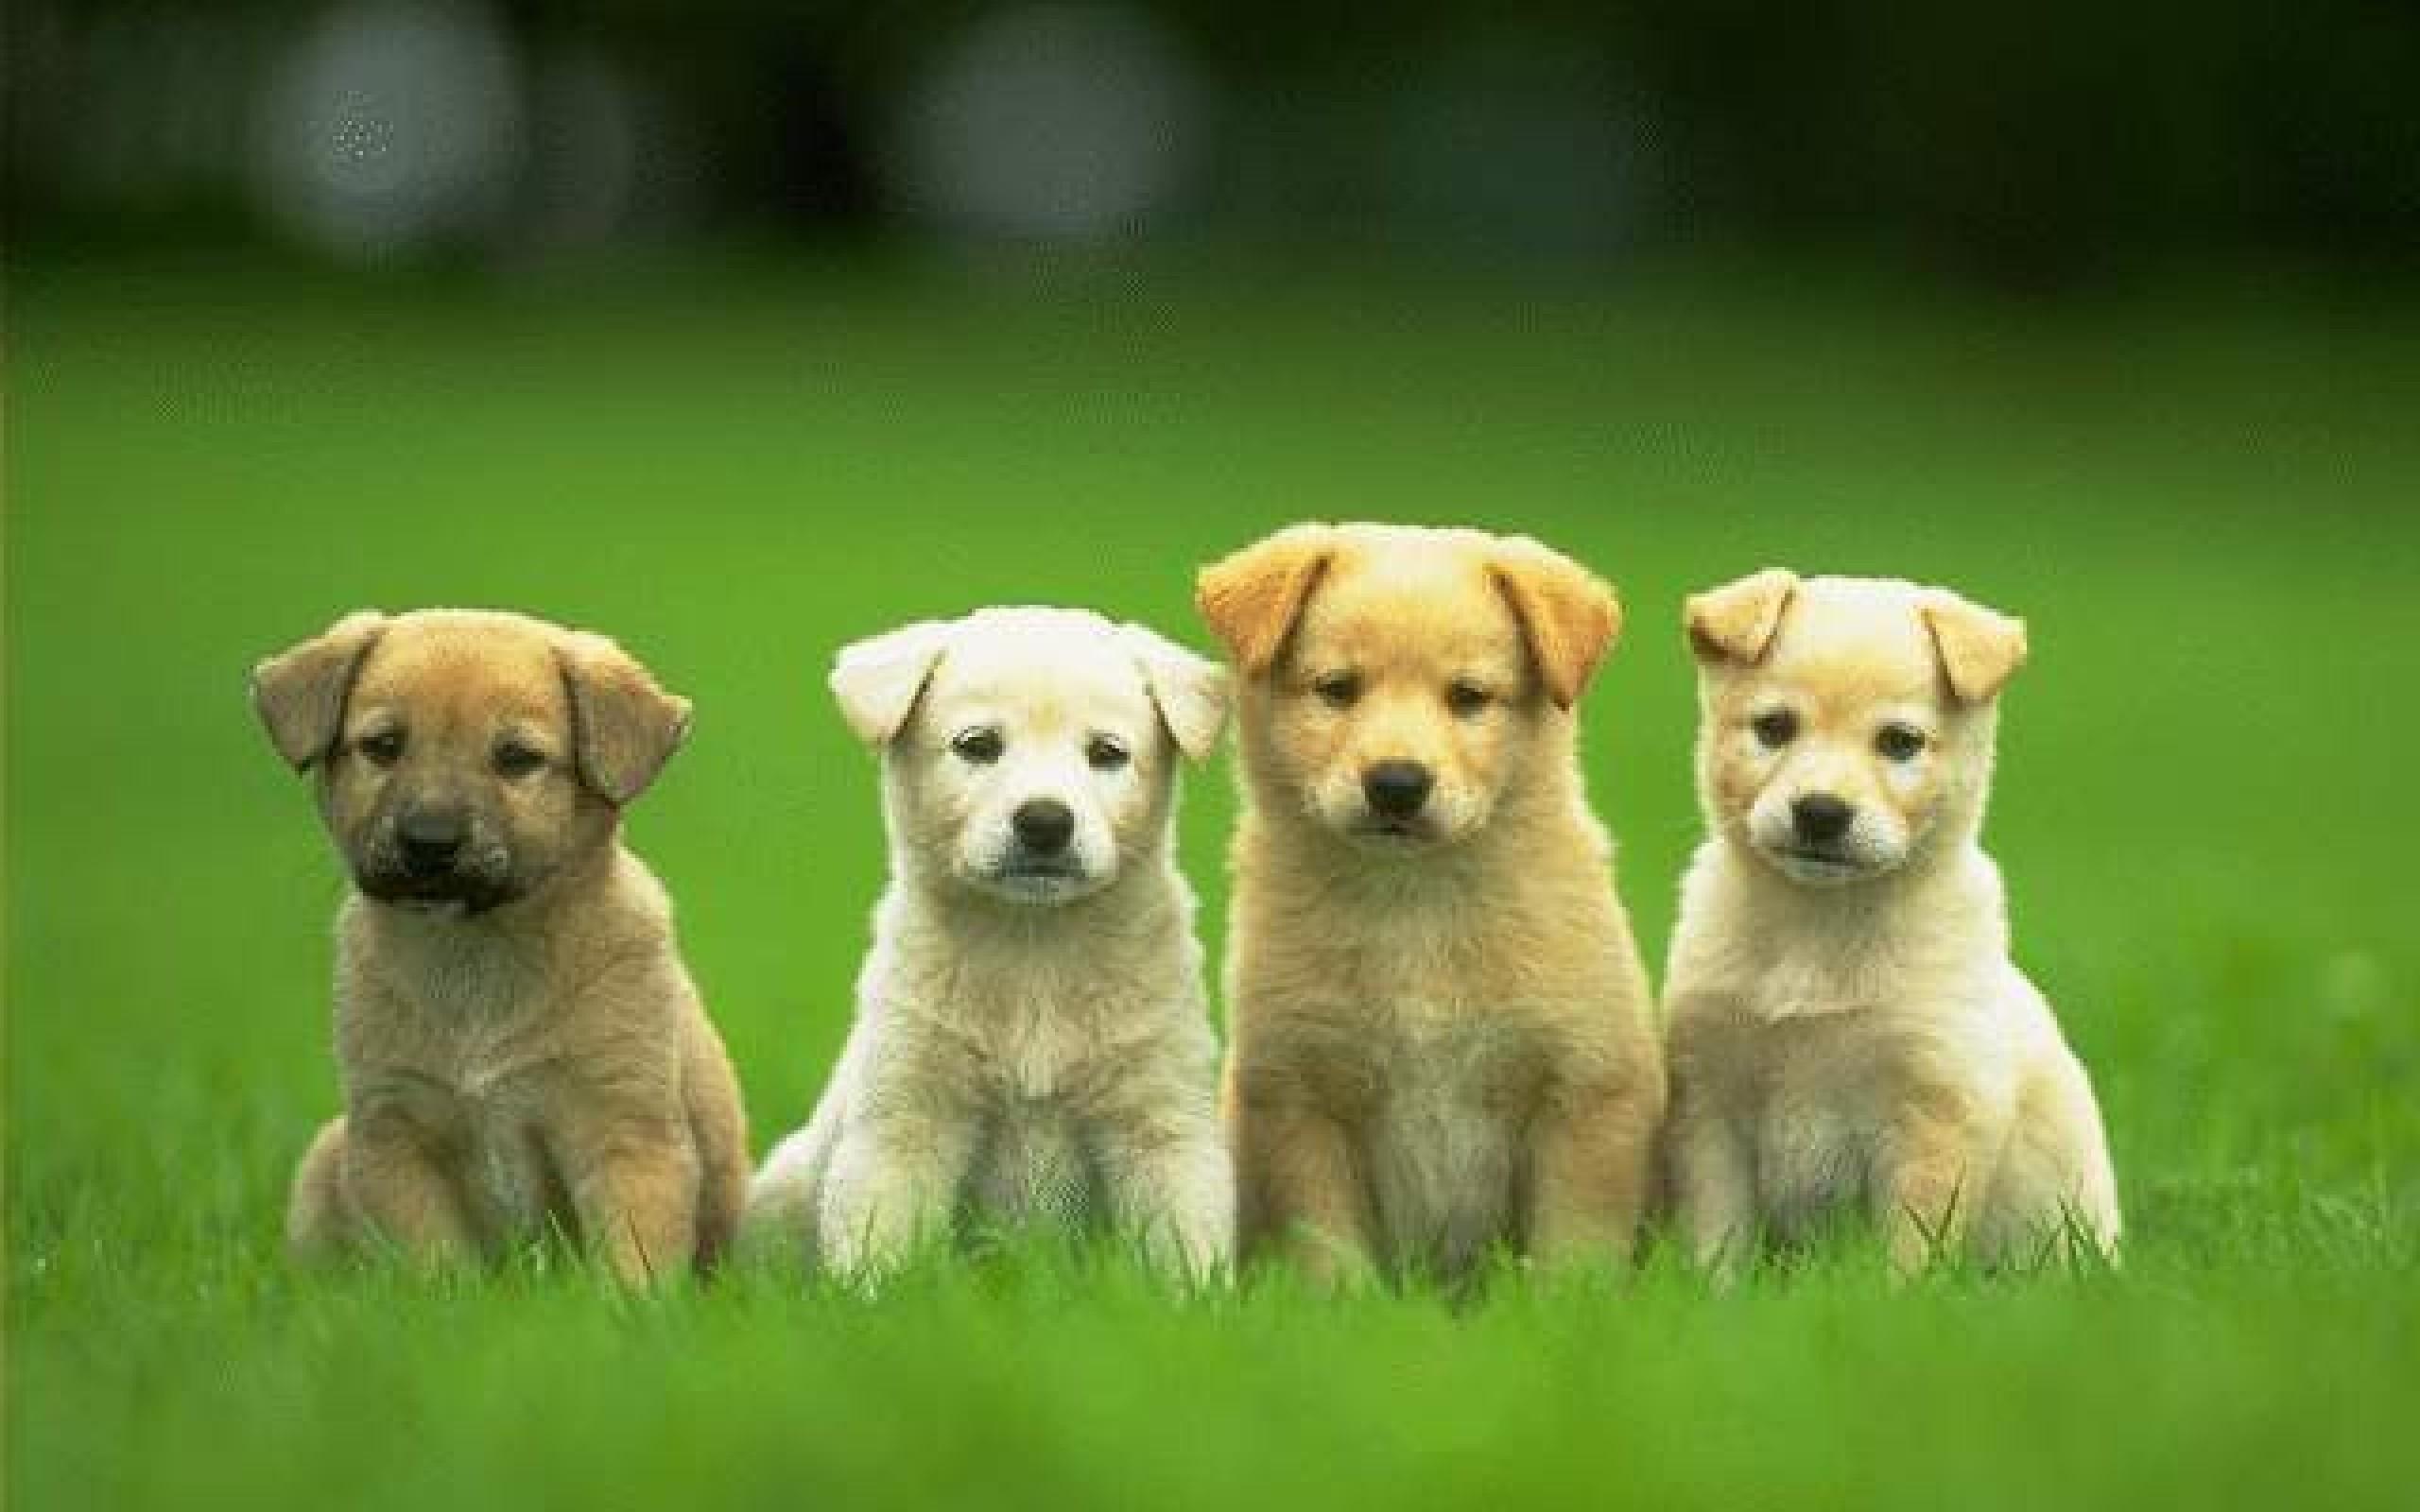 Cute Dogs. Hd Cute. : Hd Cute Dog wallpapers